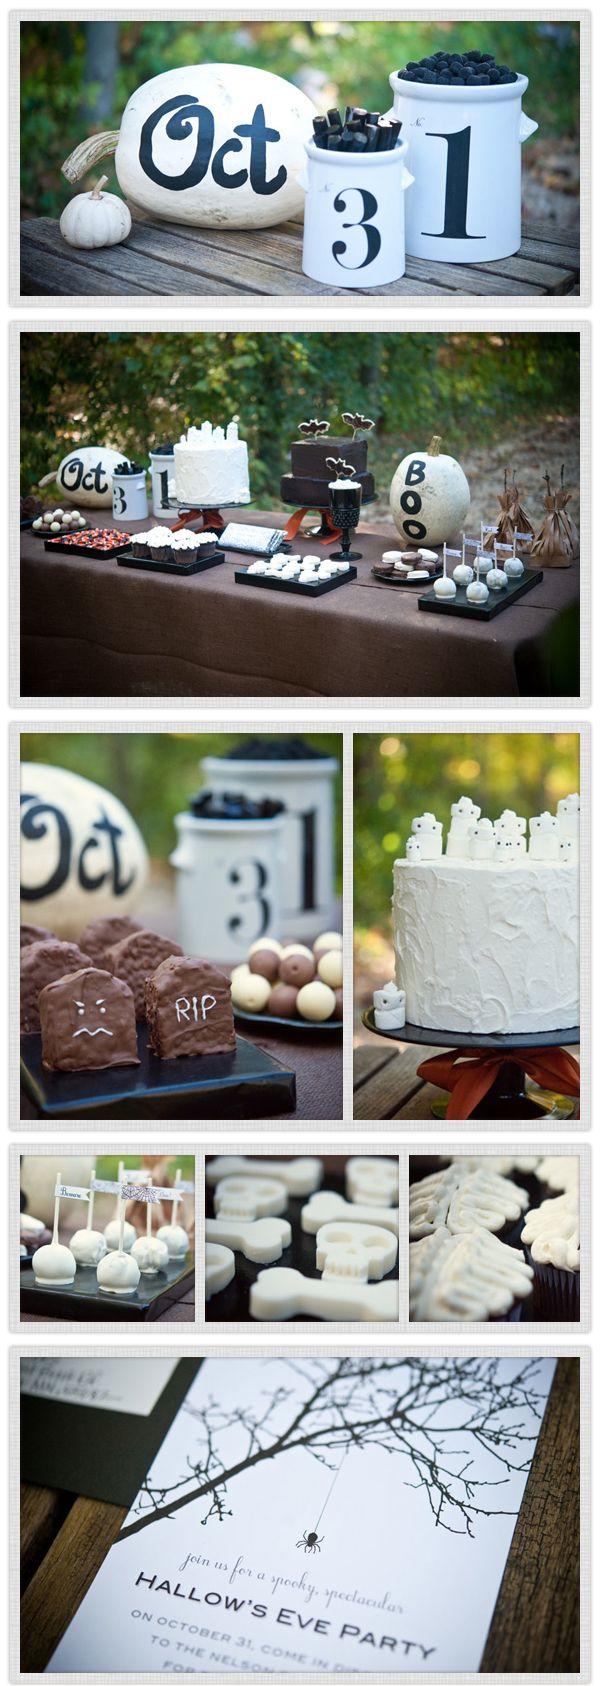 : Dessert Tables, Halloween Desserts, Halloween Decor, Diy Halloween, Halloween Parties Ideas, Halloween Tablescapes, Halloween Ideas, Desserts Tables, Party Ideas